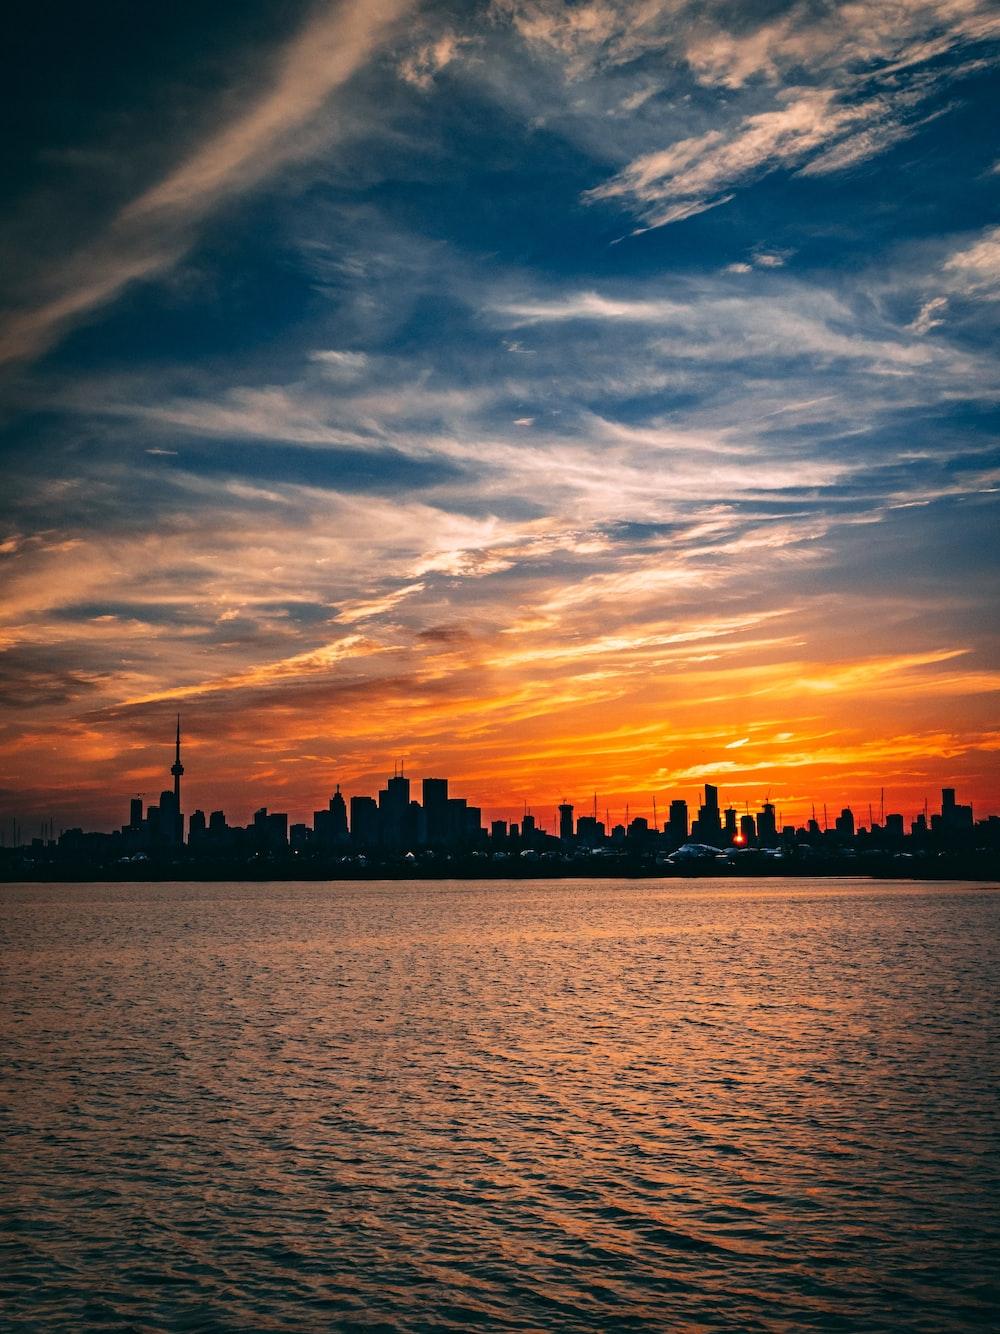 cityscape under golden hour